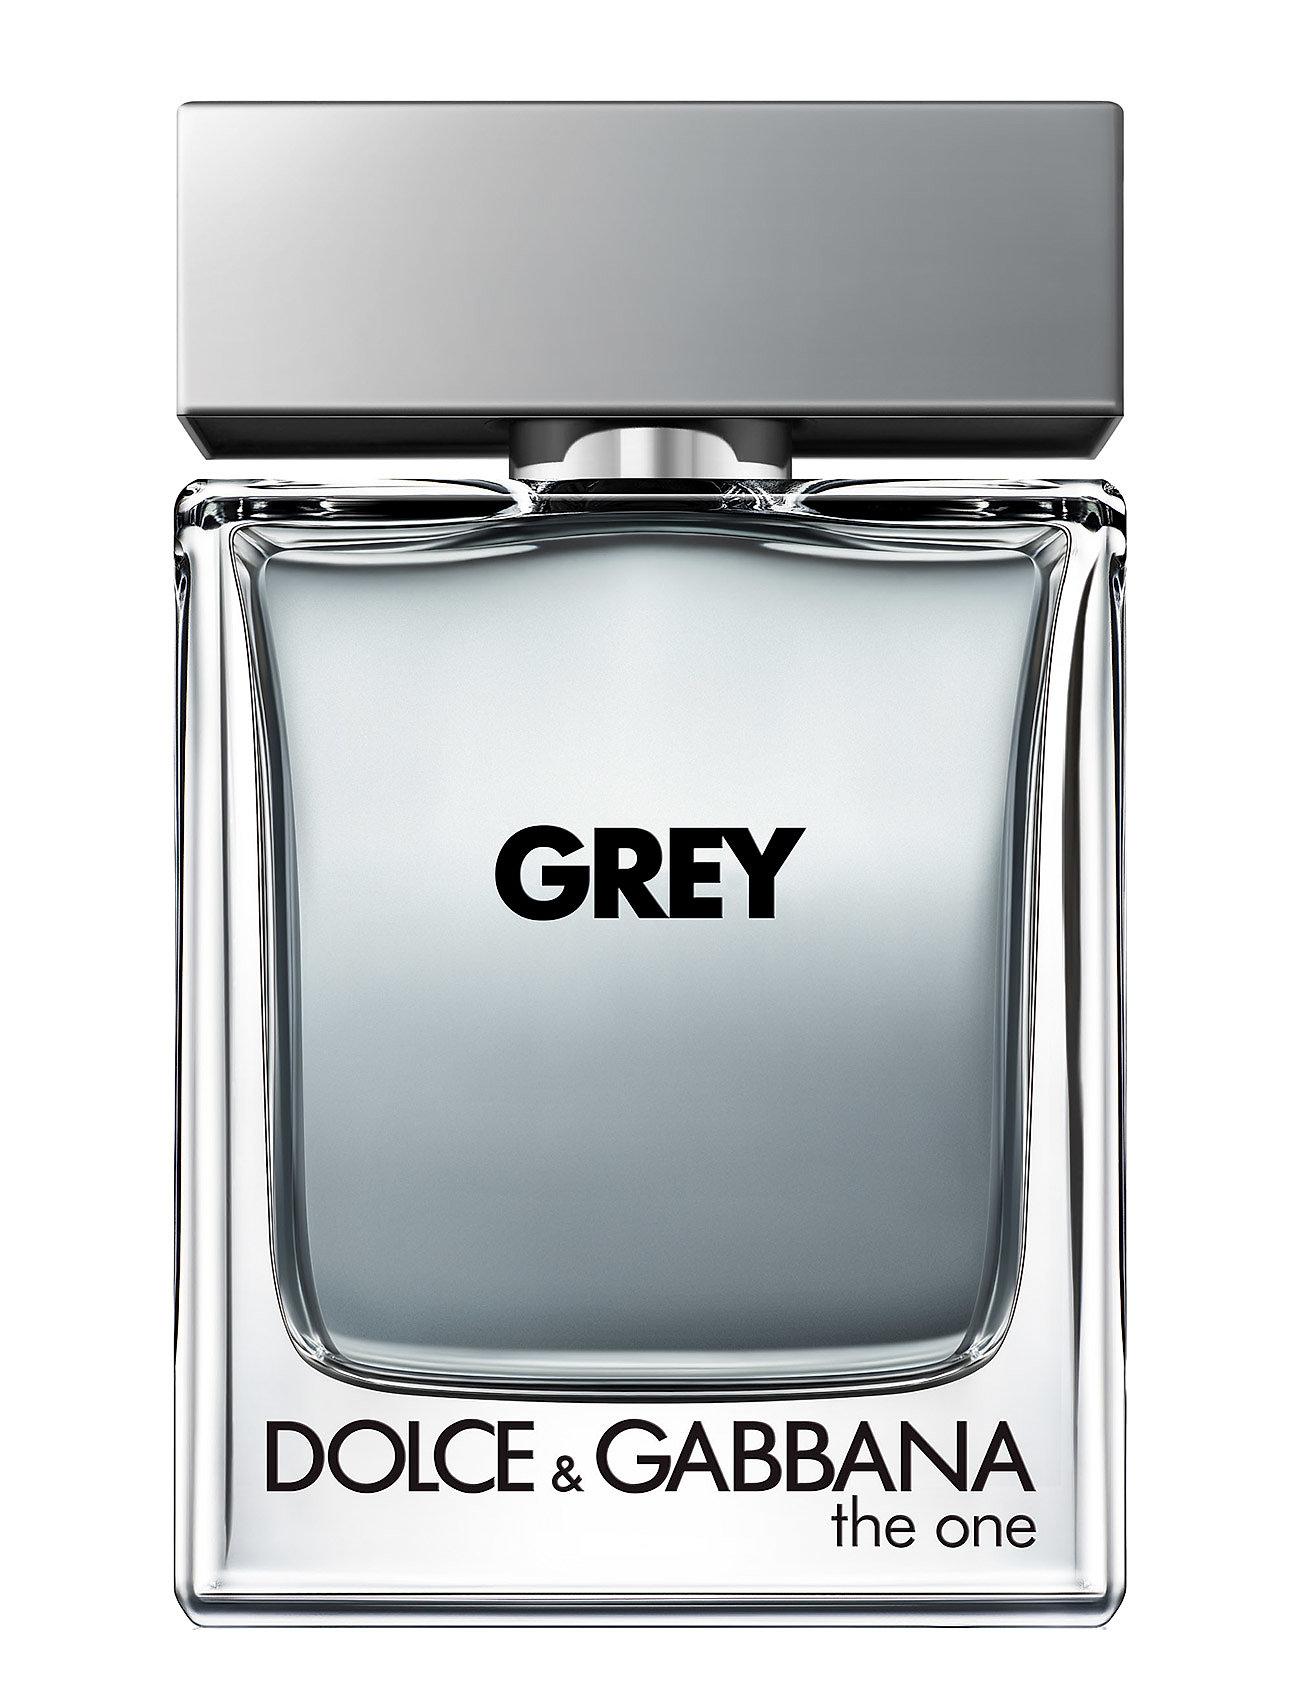 Dolce & Gabbana THE ONE FOR MEN GREYEAU DE TOILETTE INTENSE - NO COLOR